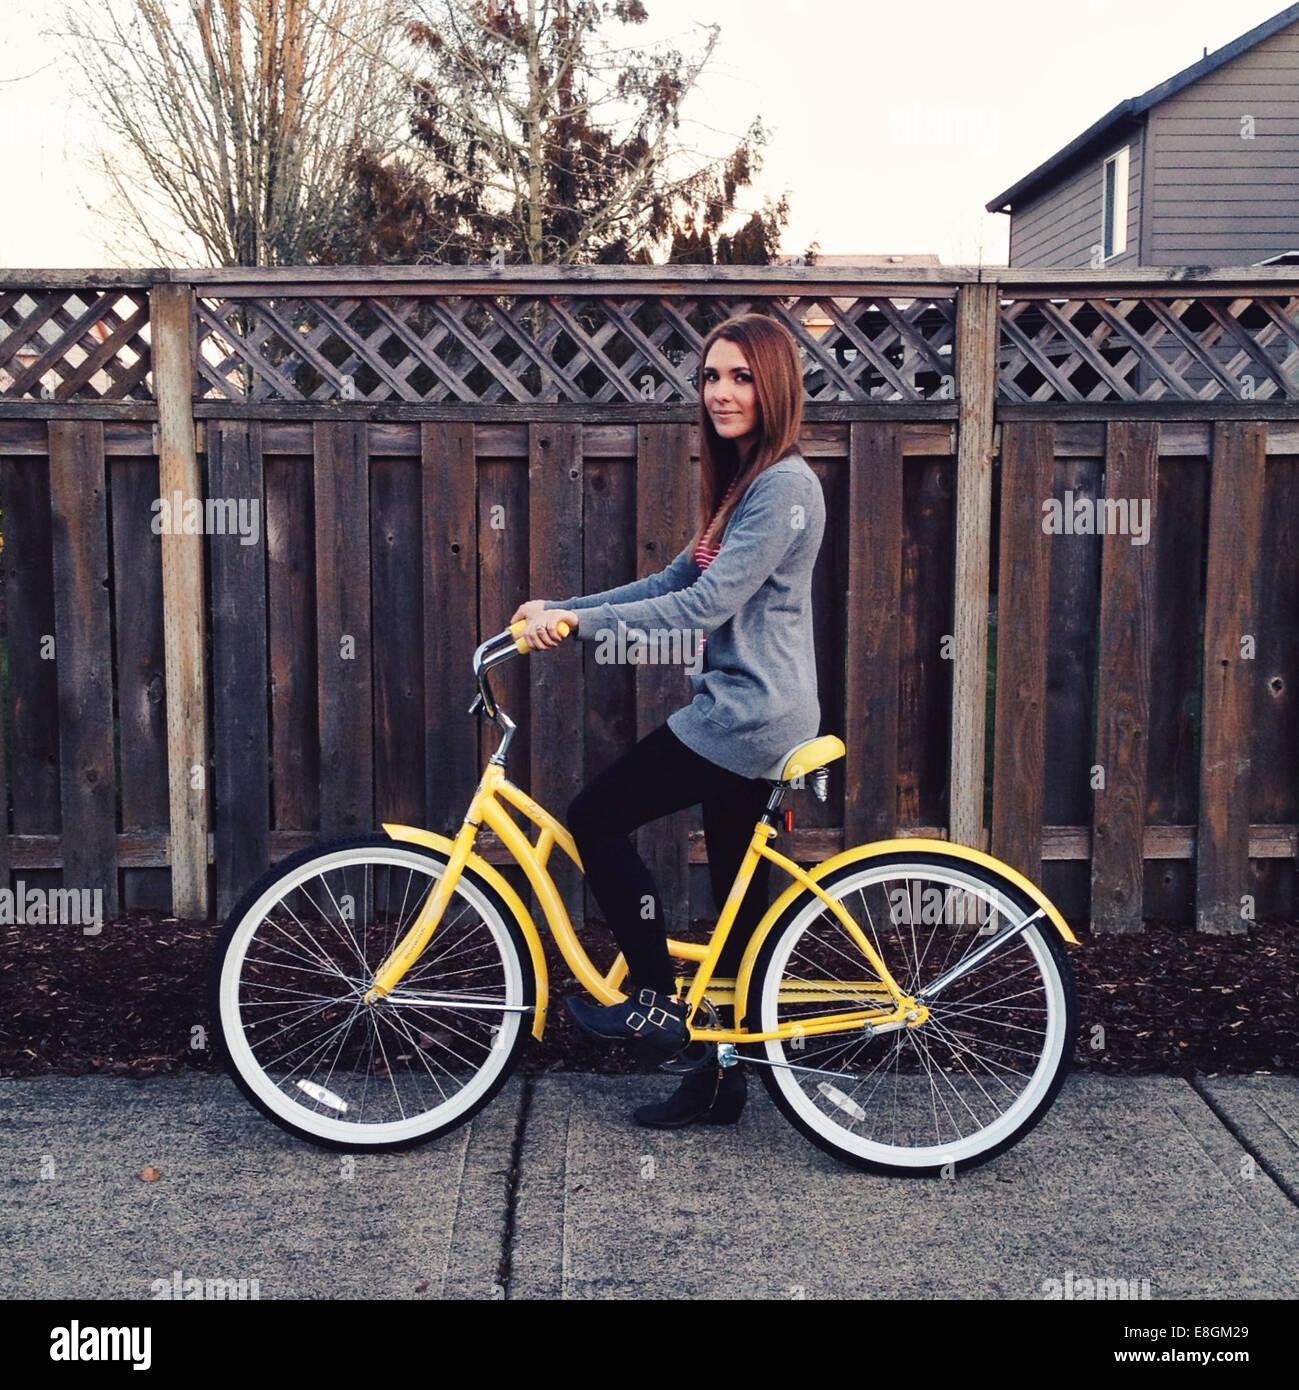 USA, Oregon, Multnomah County, Portland, Portrait of young woman riding bike - Stock Image